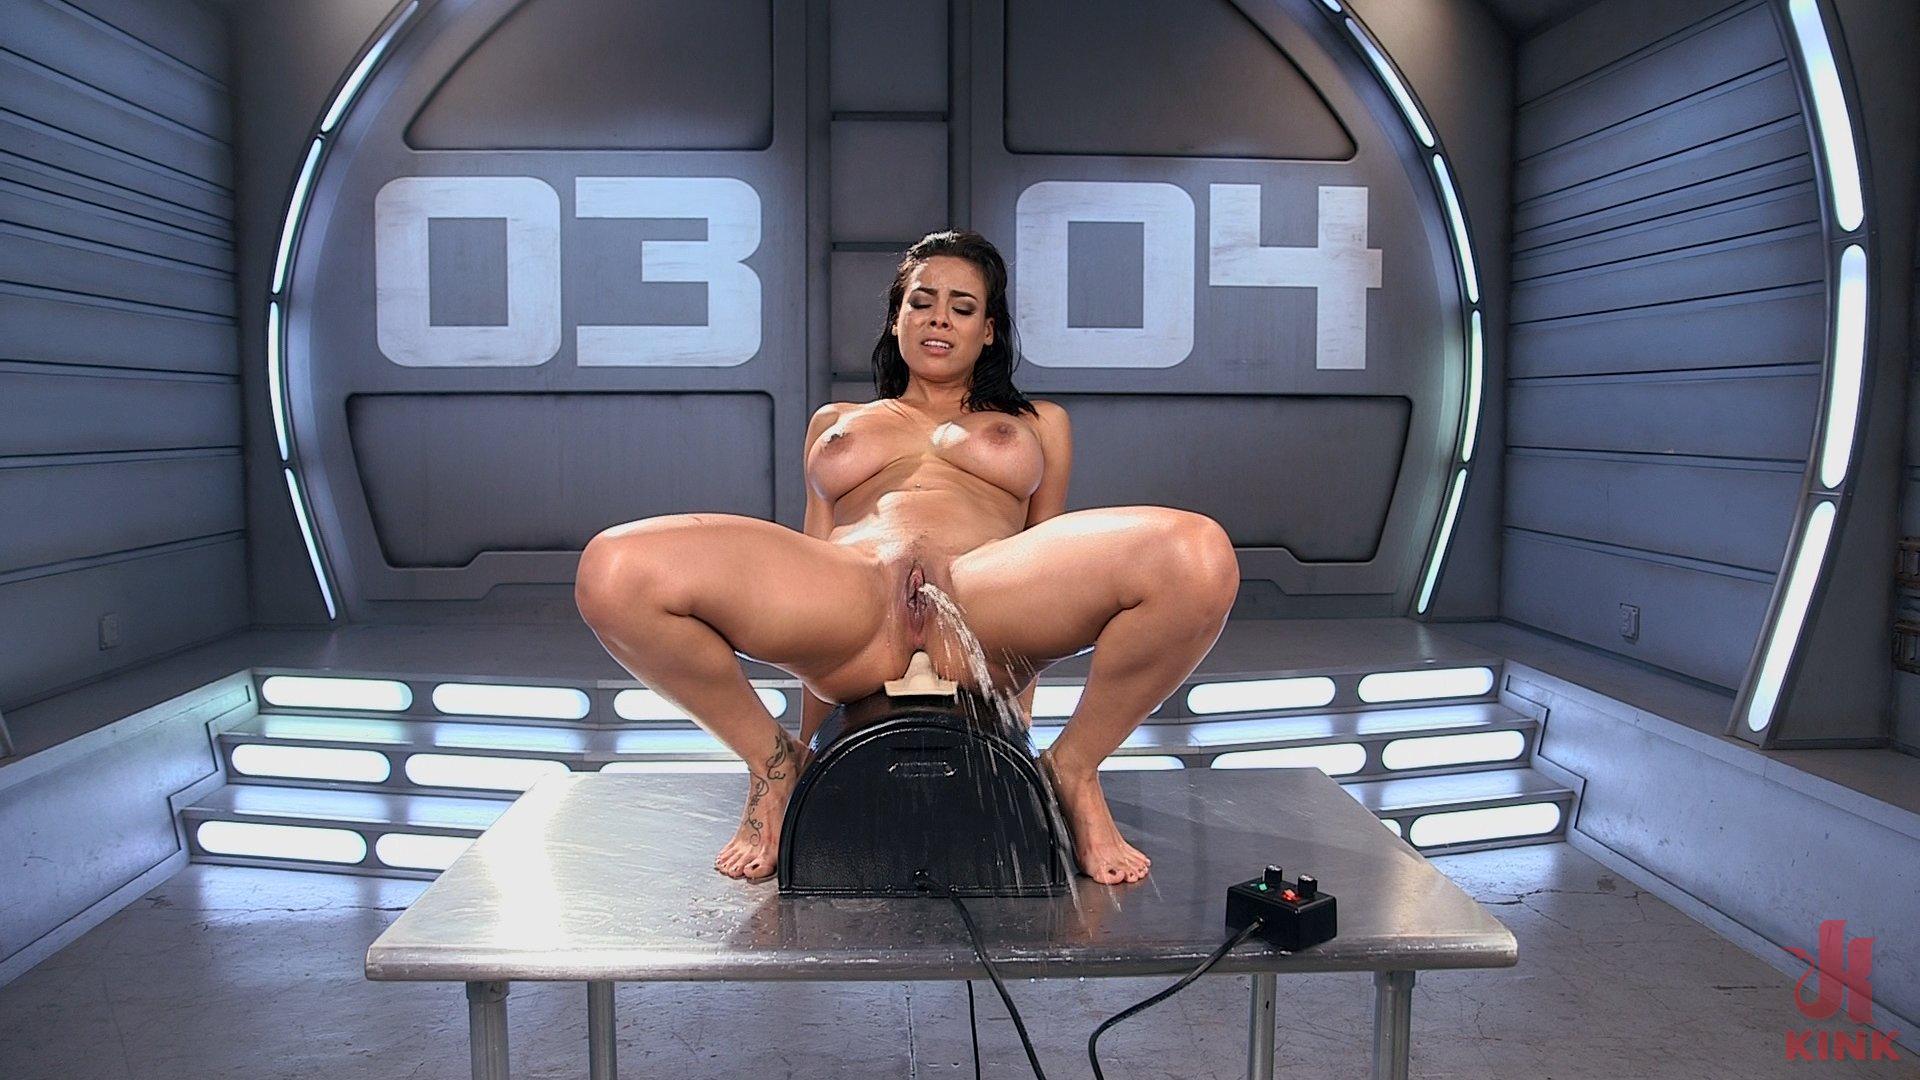 Babe car hot nude